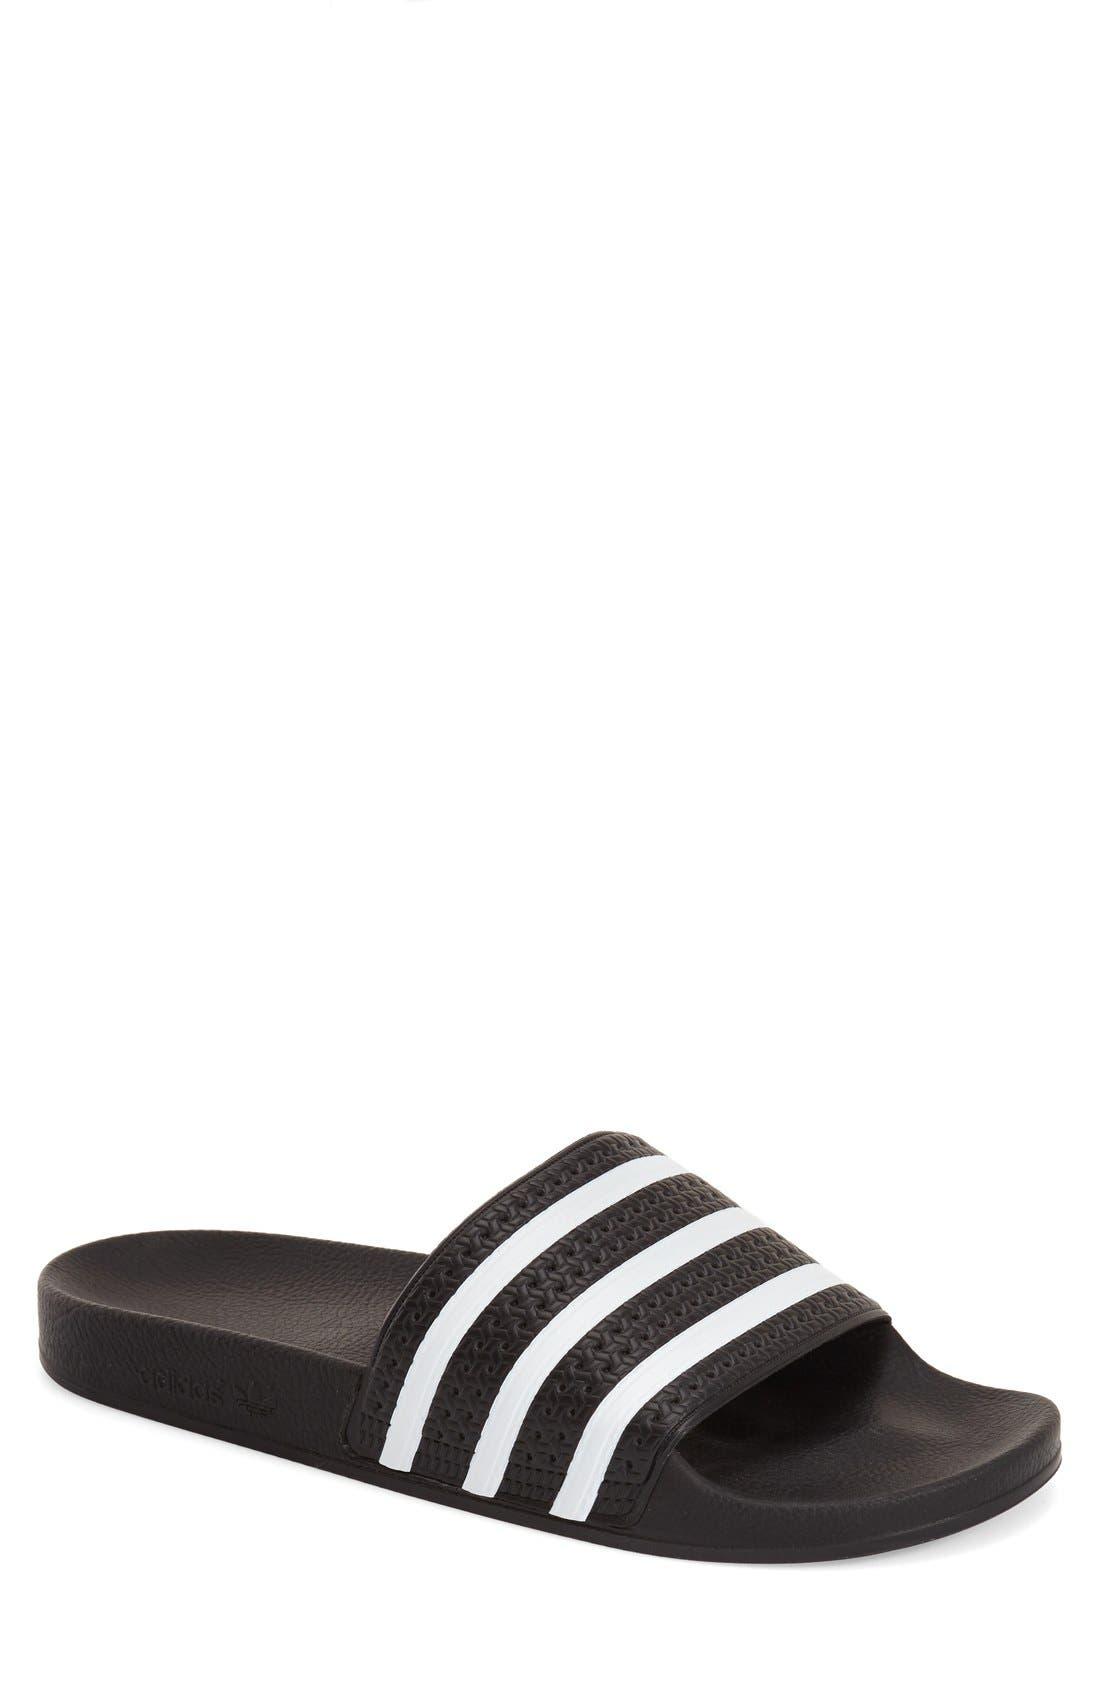 adidas Adilette Slide Sandal (Men) (Regular Retail Price: $44.95)